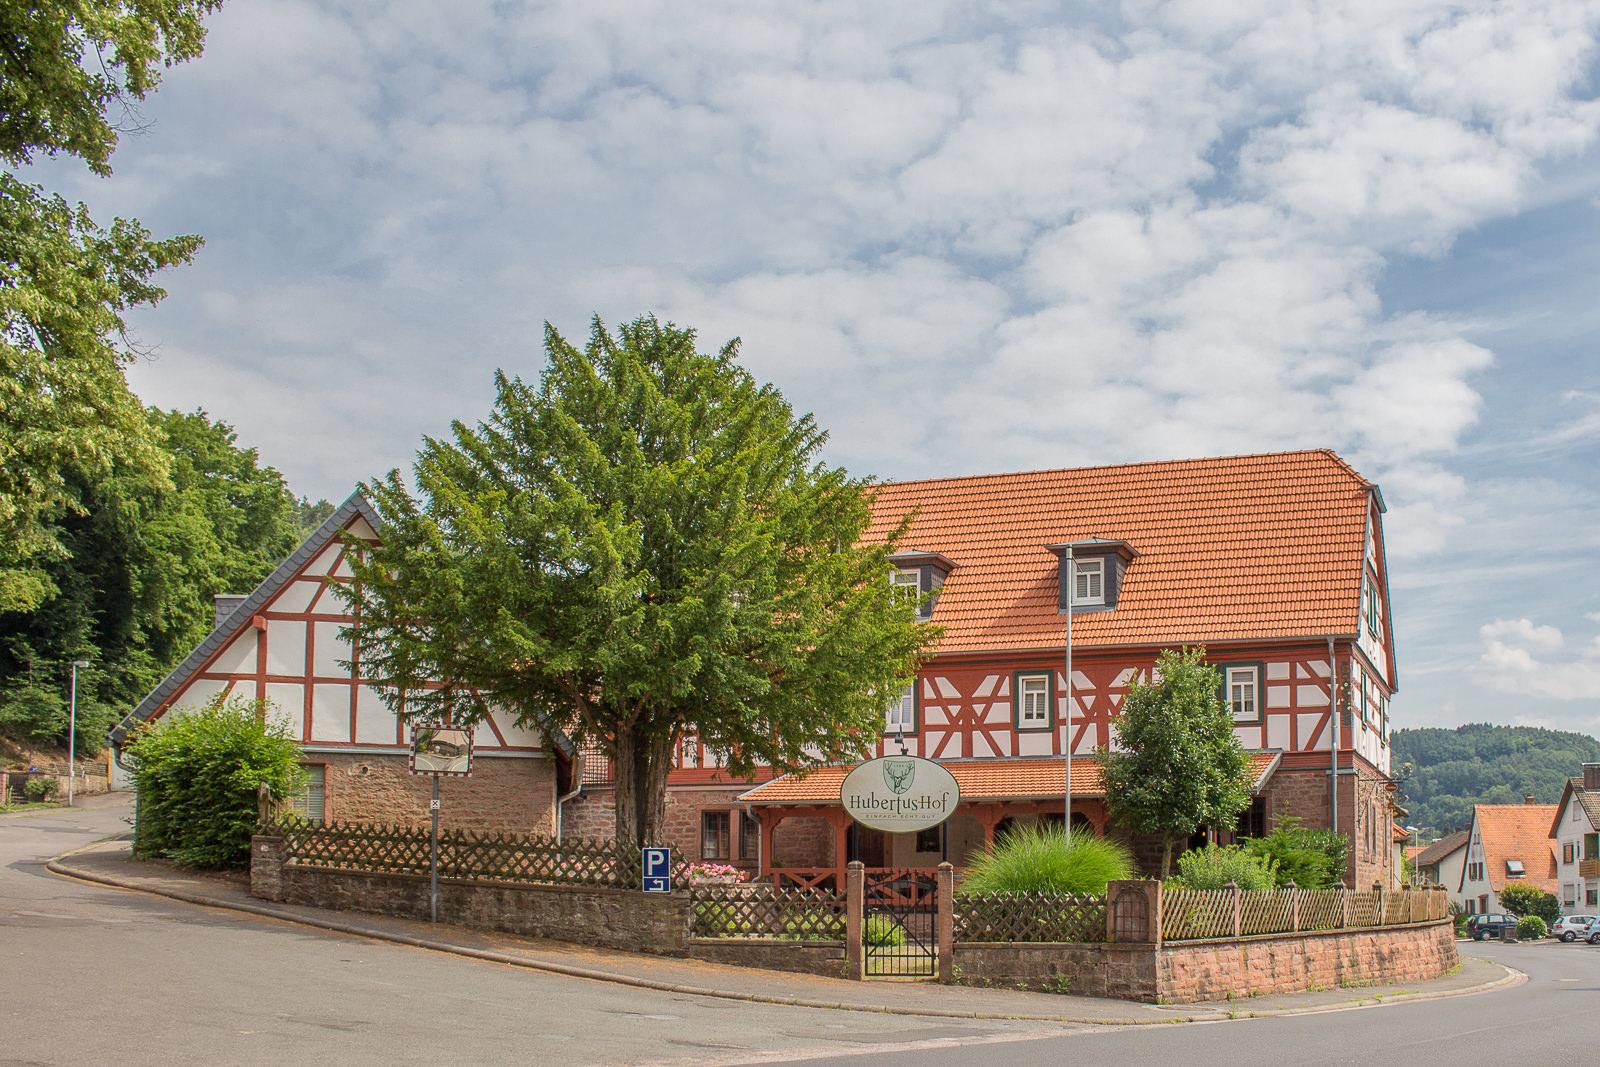 Hubertus Hof, Tagungen, Hotel, Feiern, Spessart, Bayern, Frankfurt am Main